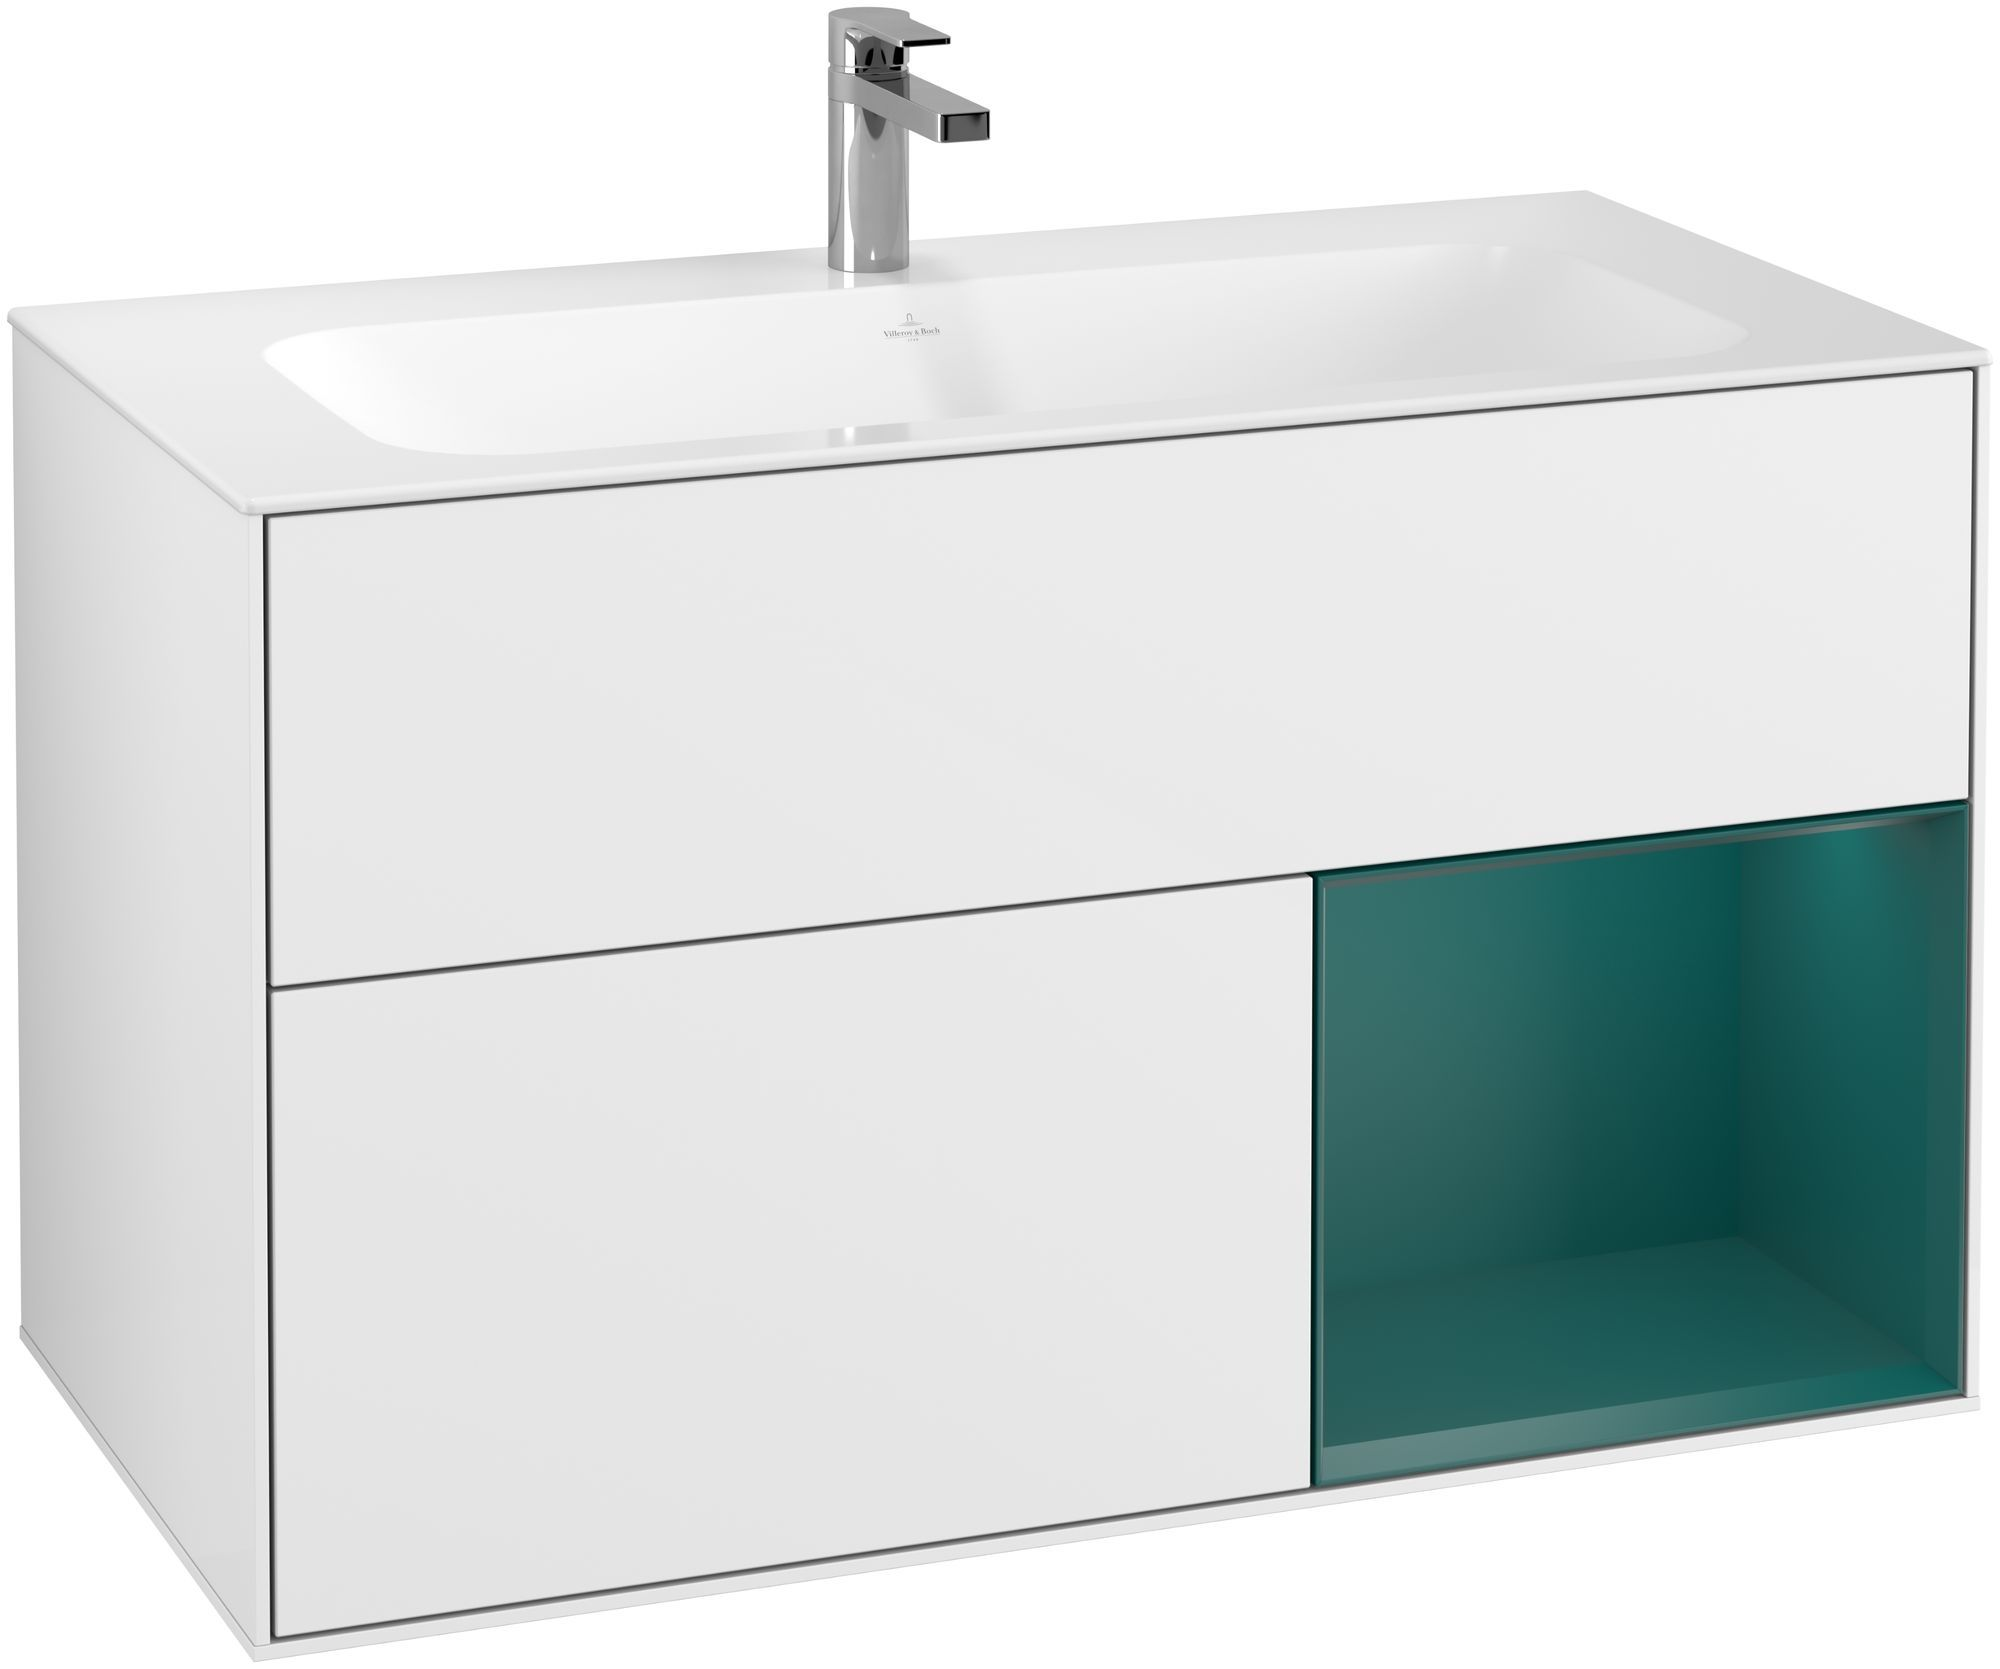 Villeroy & Boch Finion G04 Waschtischunterschrank mit Regalelement 2 Auszüge LED-Beleuchtung B:99,6xH:59,1xT:49,8cm Front, Korpus: Glossy White Lack, Regal: Cedar G040GSGF